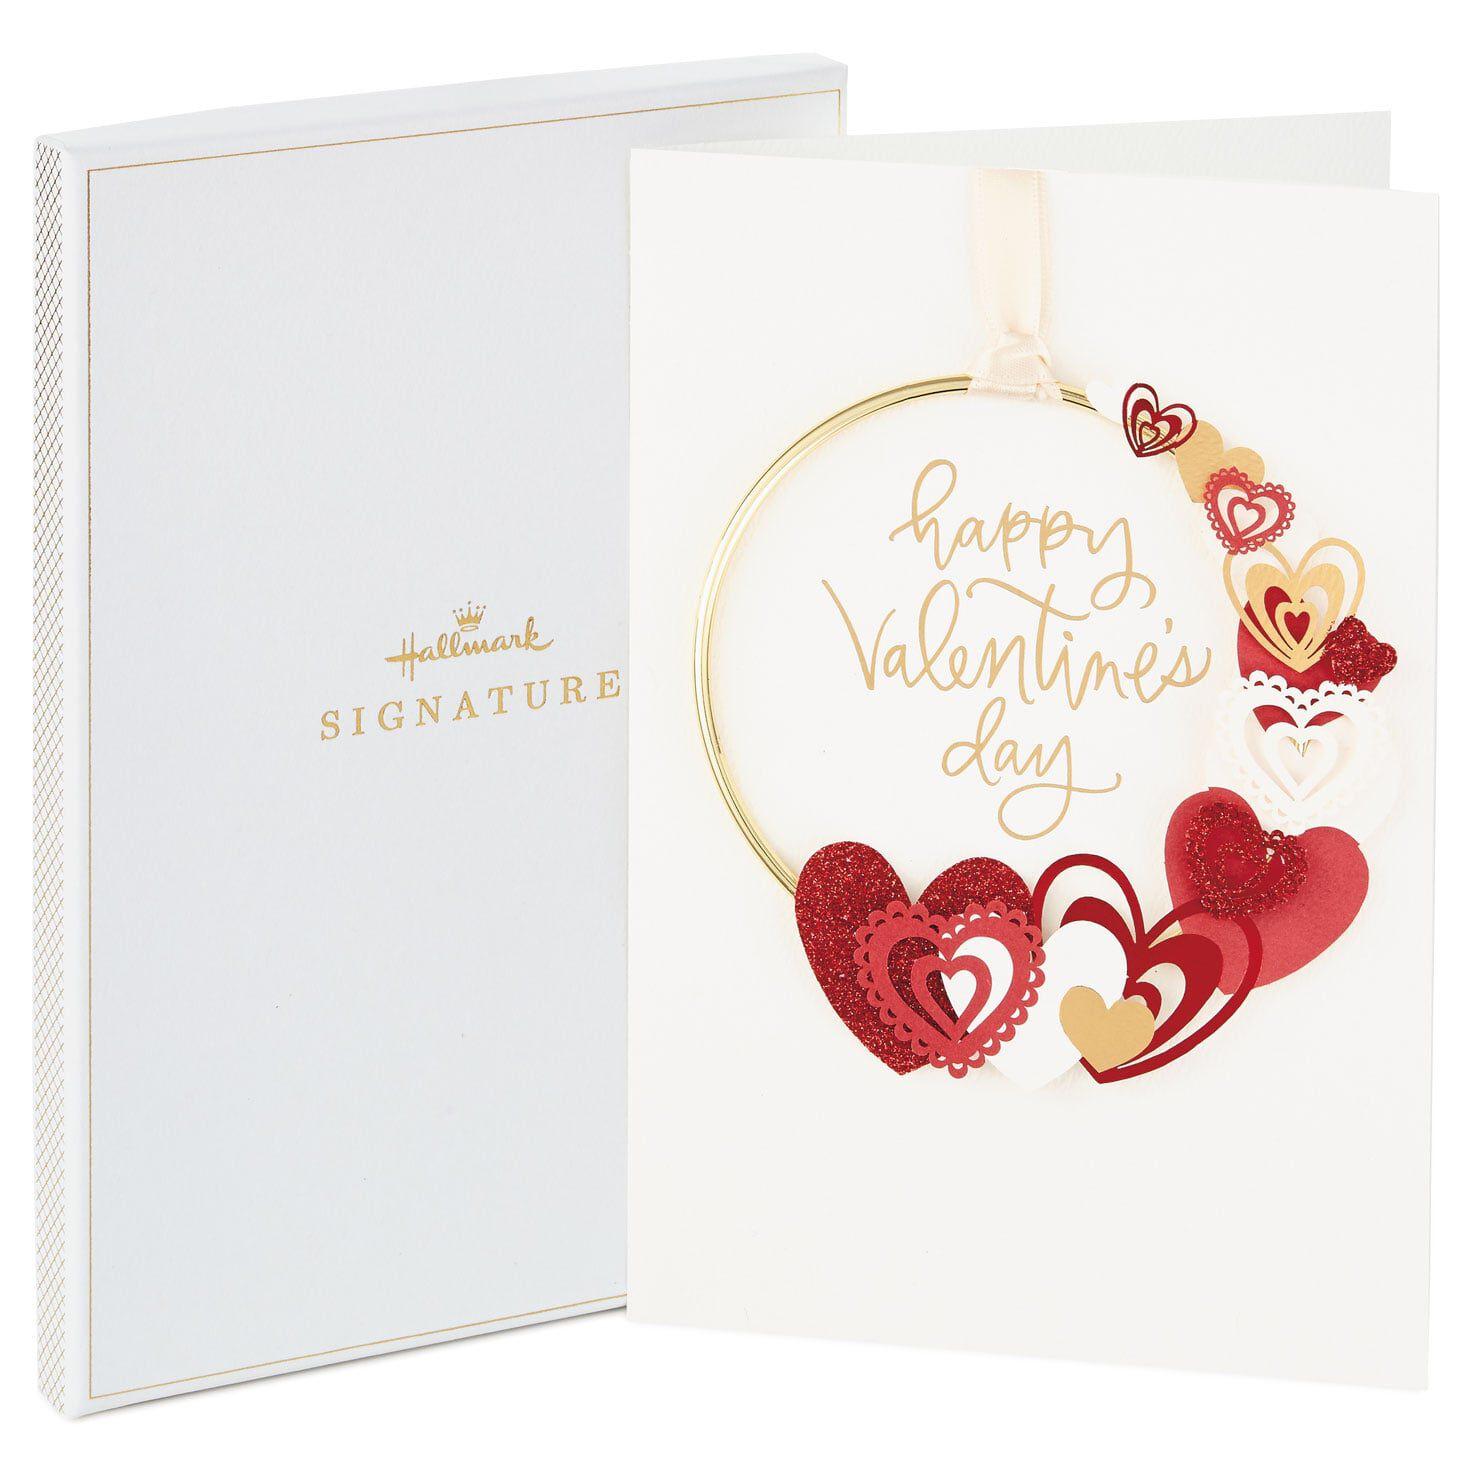 Hallmark Signature 3D Valentine/'s Day Card